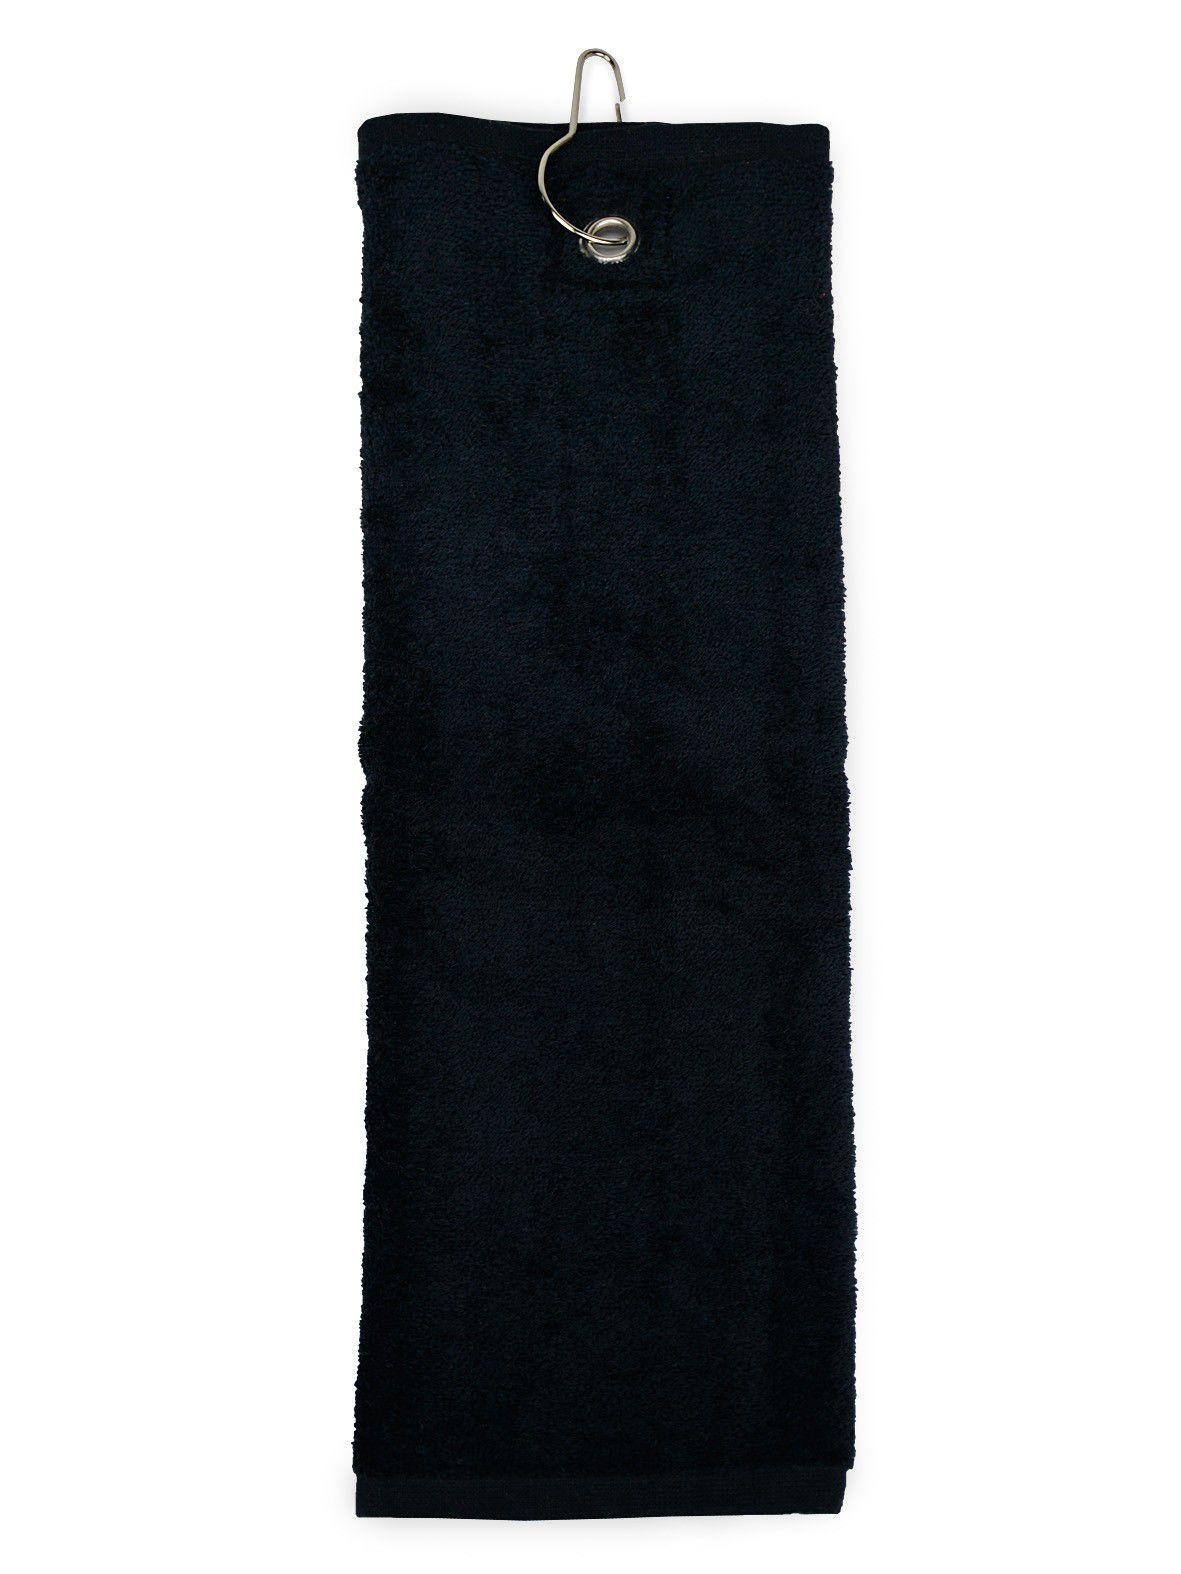 The One Golfhanddoek 450 gram Zwart